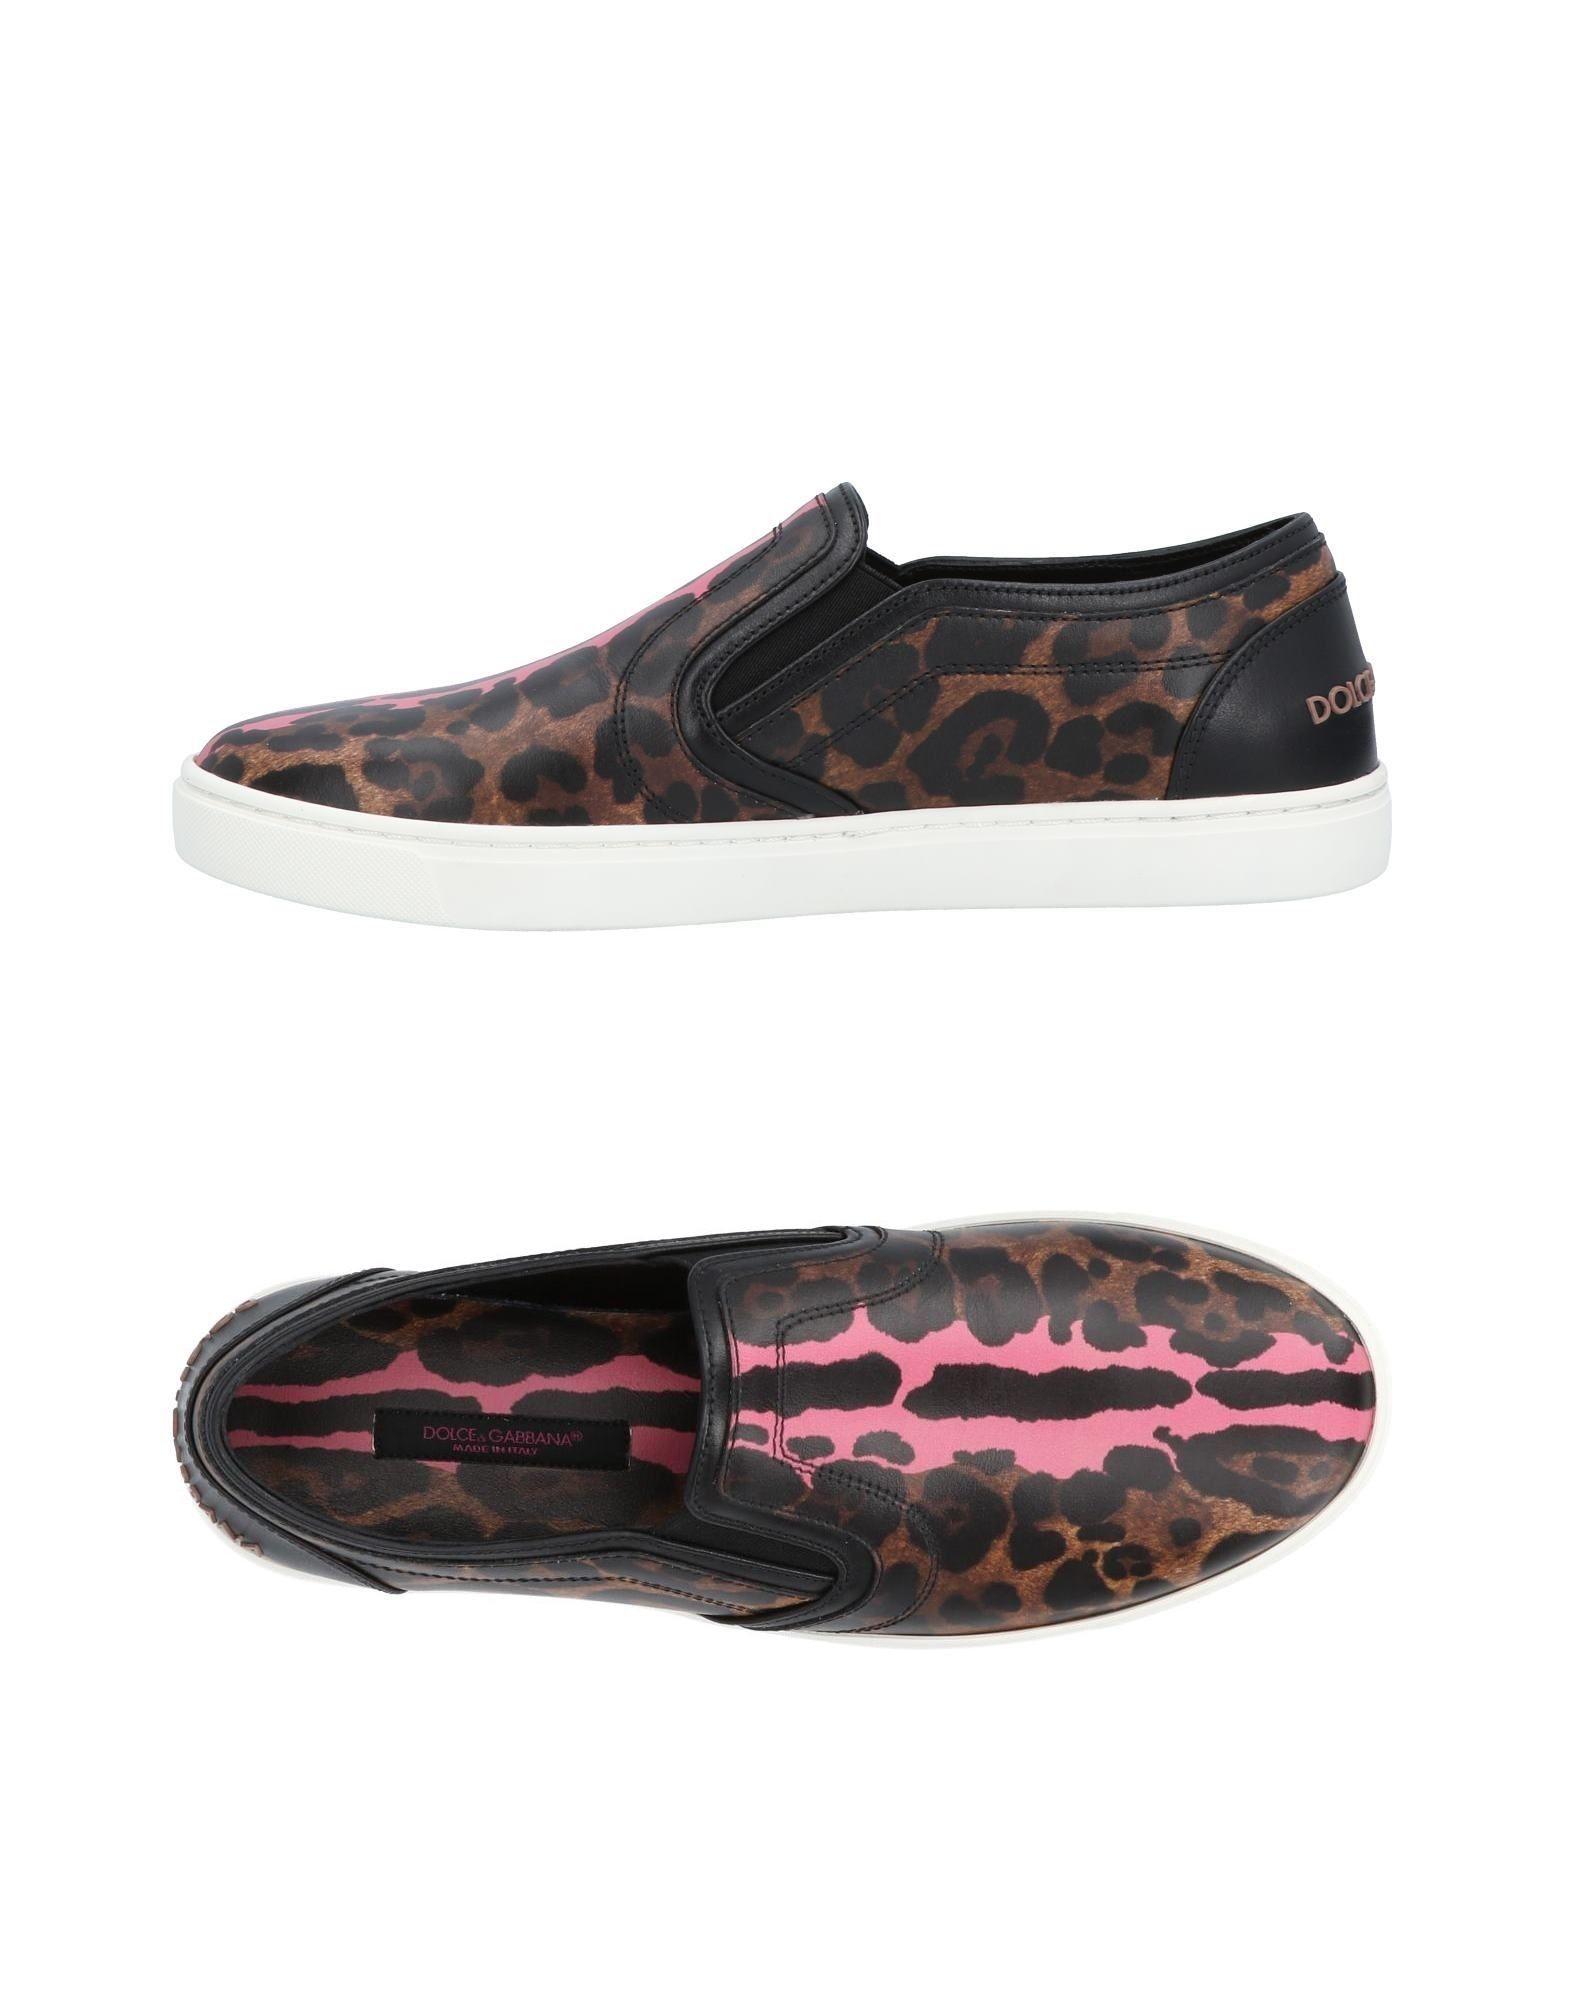 Sneakers Dolce & Gabbana Femme - Sneakers Dolce & Gabbana sur